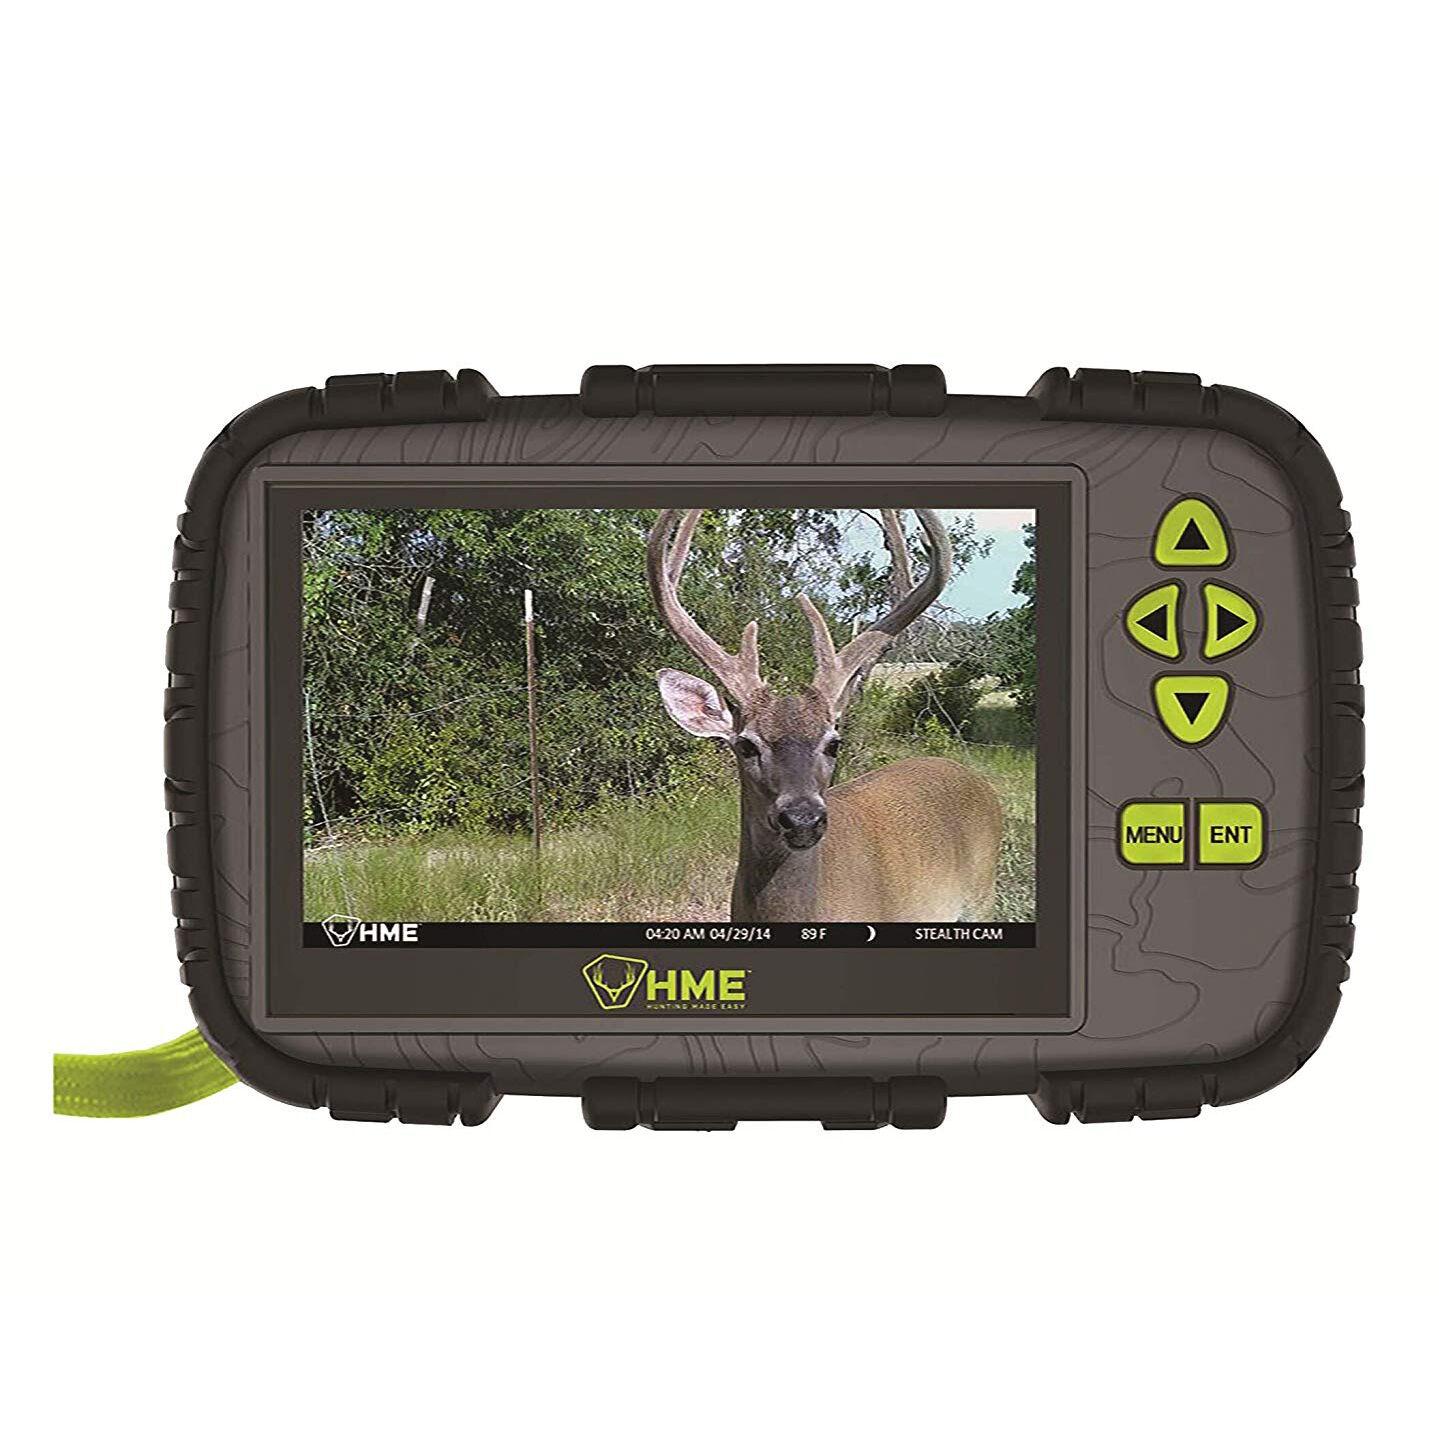 Stealth Cam HME SD Card Viewer w/LCD Screen